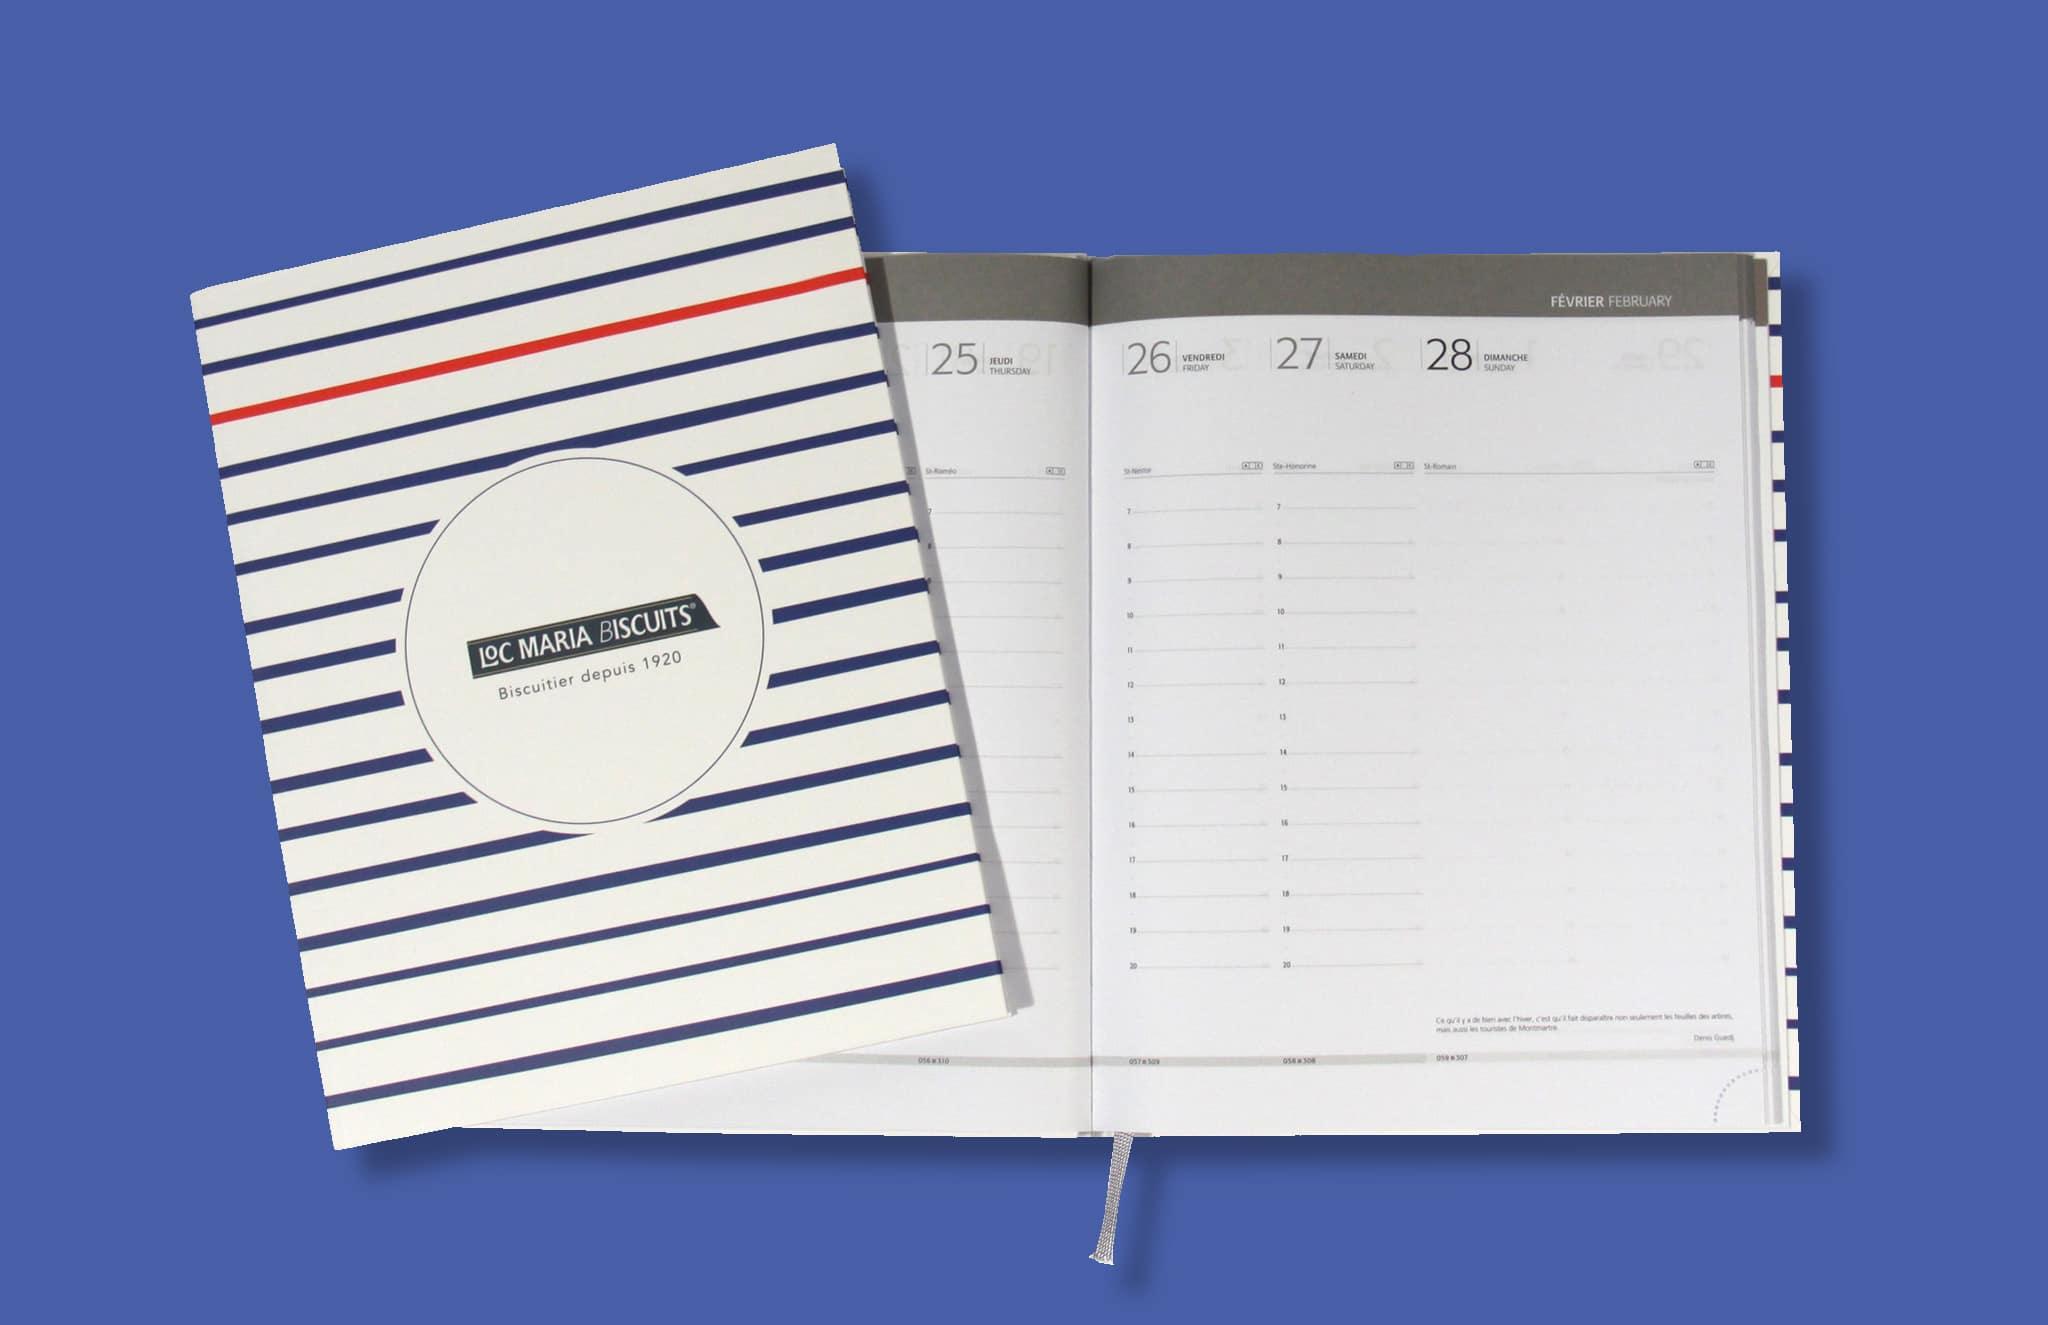 Agenda Bureau V27 Couverture Imprimee Reliure Emboitee